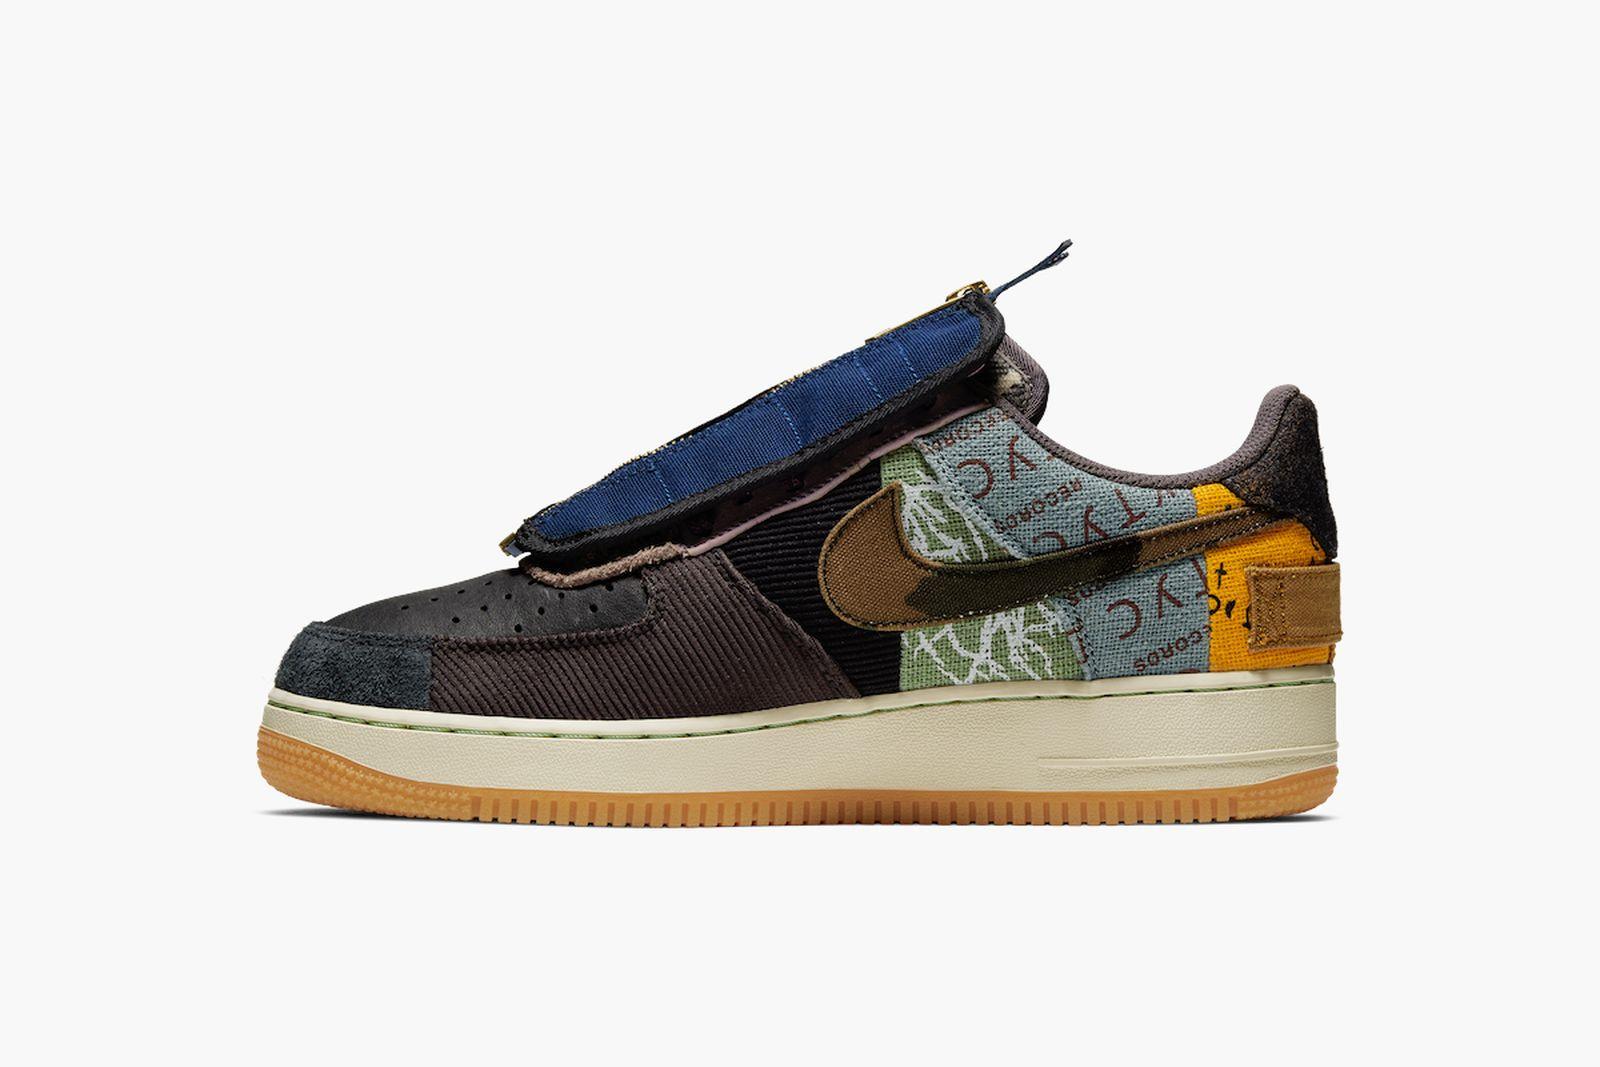 Travis Scott Nike Air Force 1 x Cactus Jack